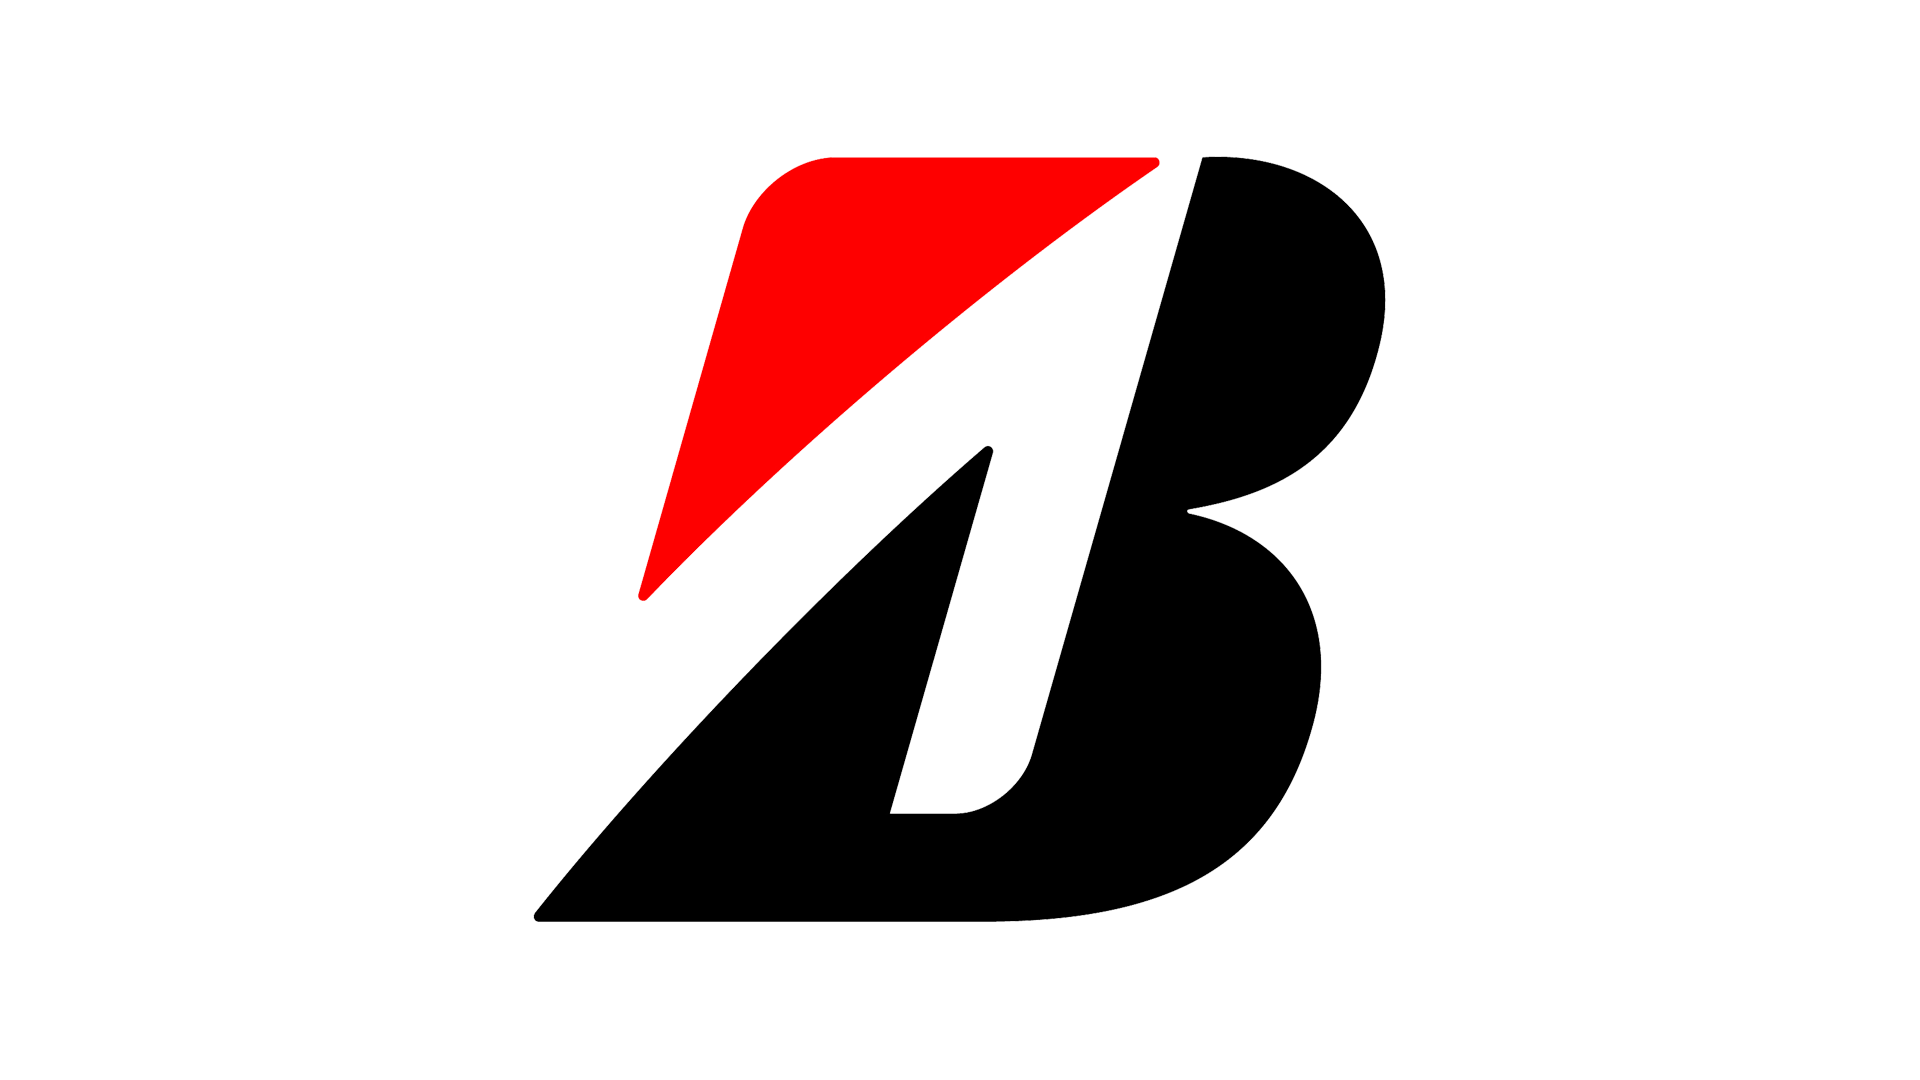 bridgestone logo, hd png, information | carlogos